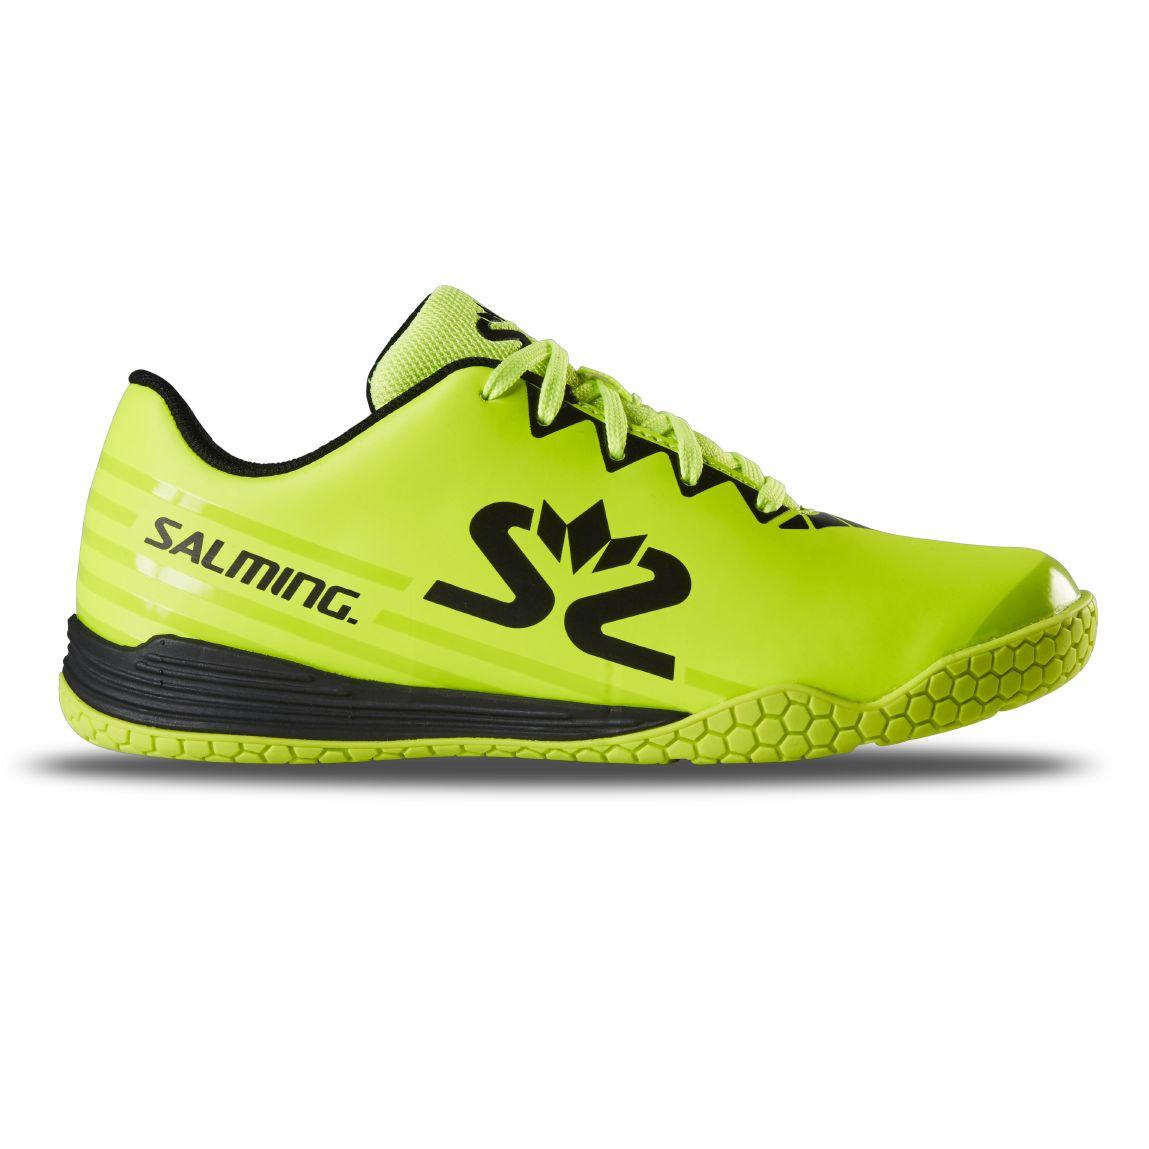 Salming Spark Shoe Kid Fluo Yellow/Black 13,5 UK - 32 EUR - 20,5 cm